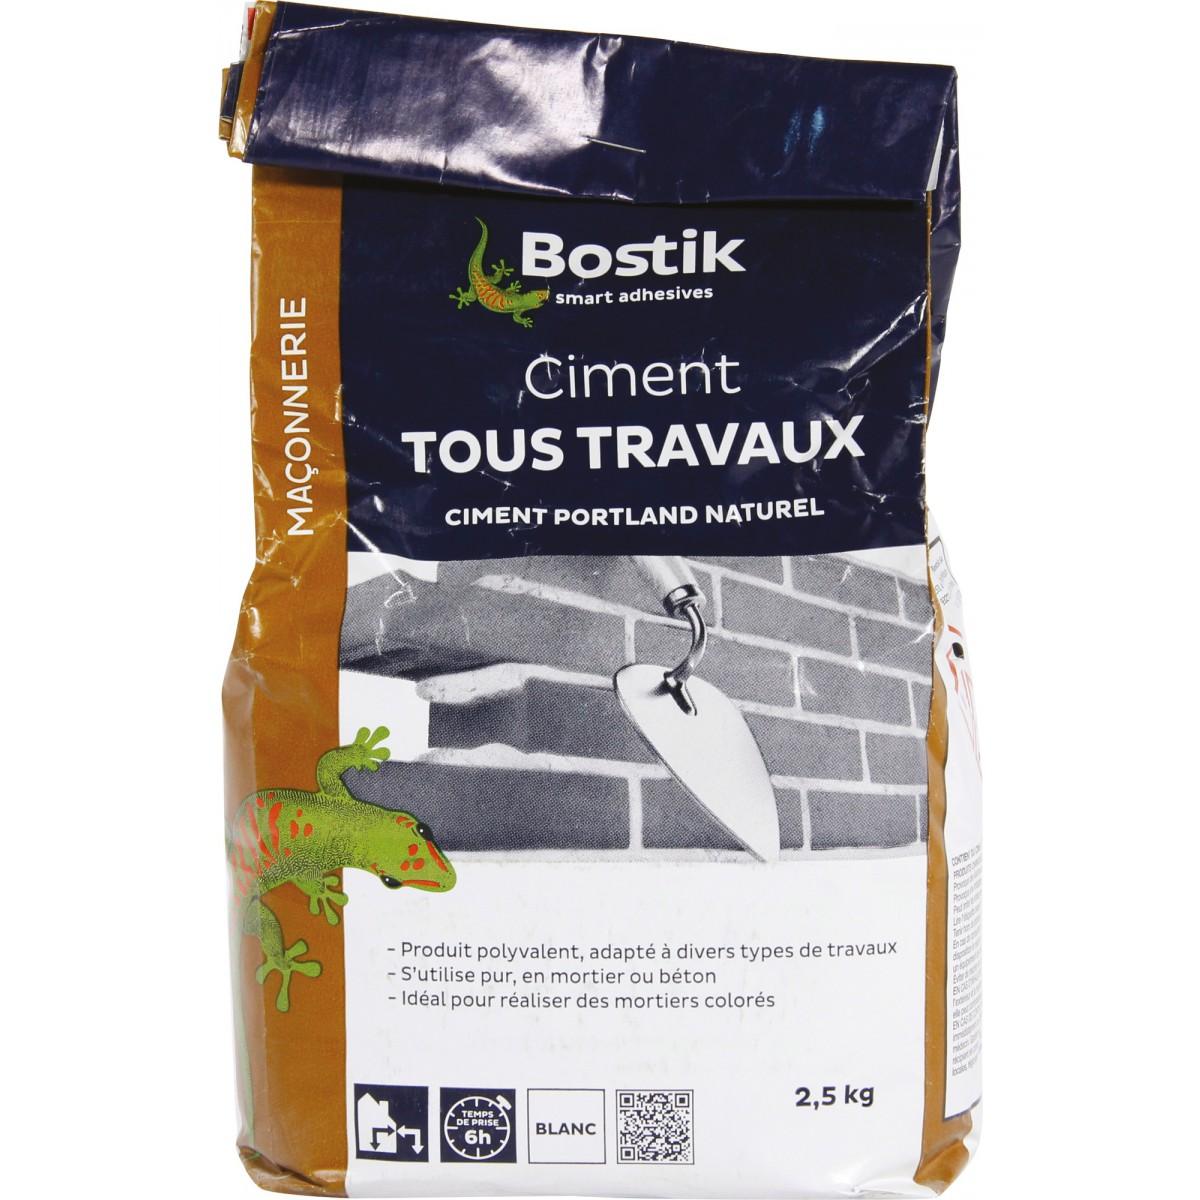 Ciment tous travaux Bostik - Blanc - Sac 2,5 kg